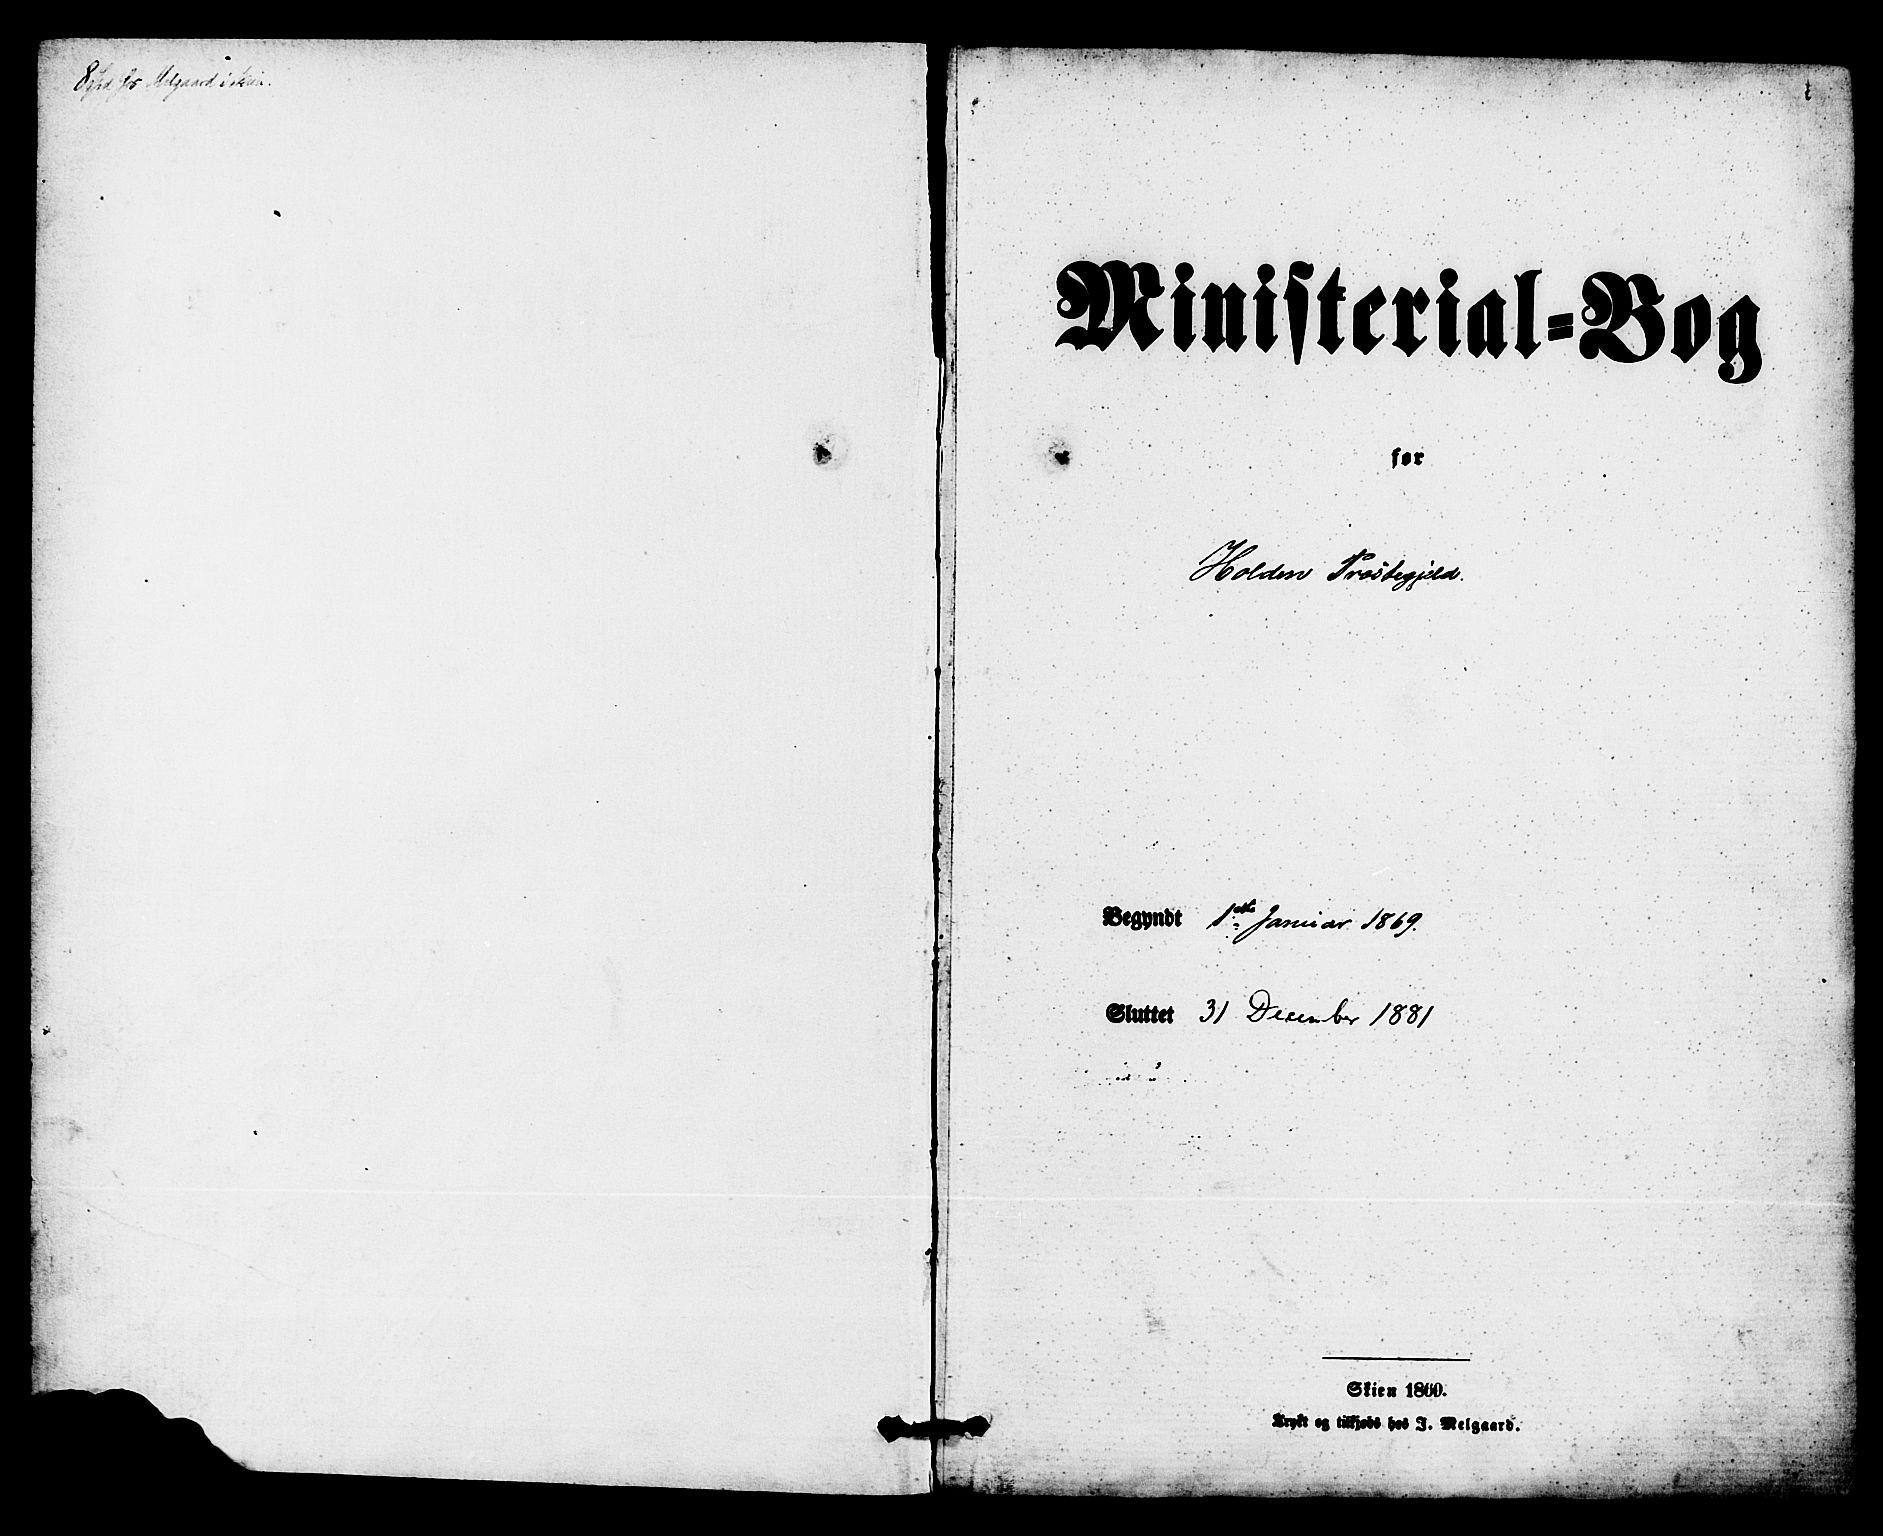 SAKO, Holla kirkebøker, F/Fa/L0007: Ministerialbok nr. 7, 1869-1881, s. 1